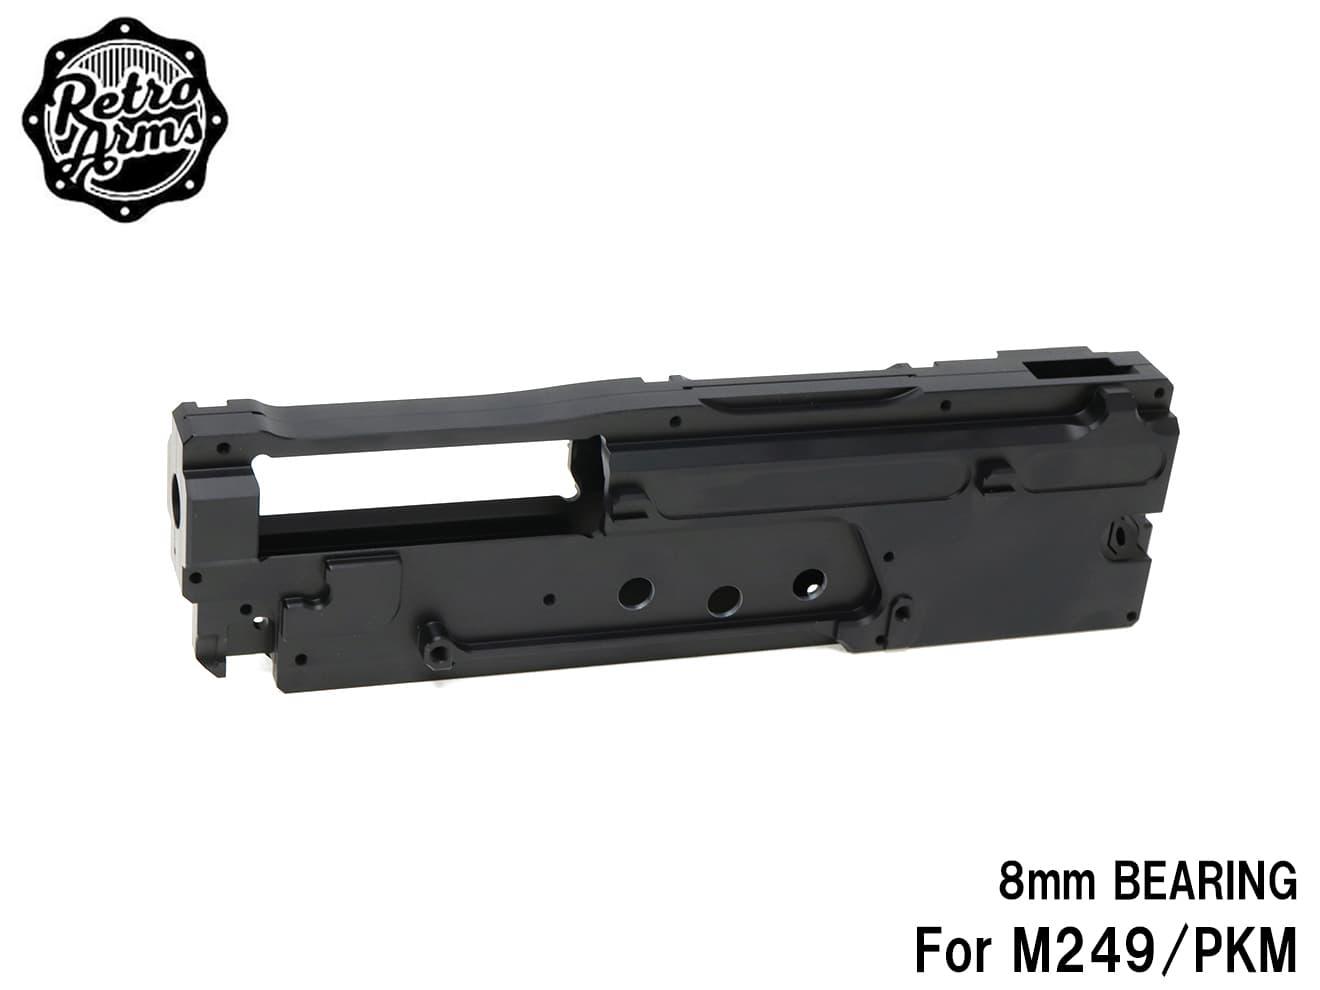 RETRO ARMS CNC ギアボックス for M249/PKM 8mmベアリング仕様◆電動ガン/メカボックス/ミニミ/A&K/ブラックアルマイト